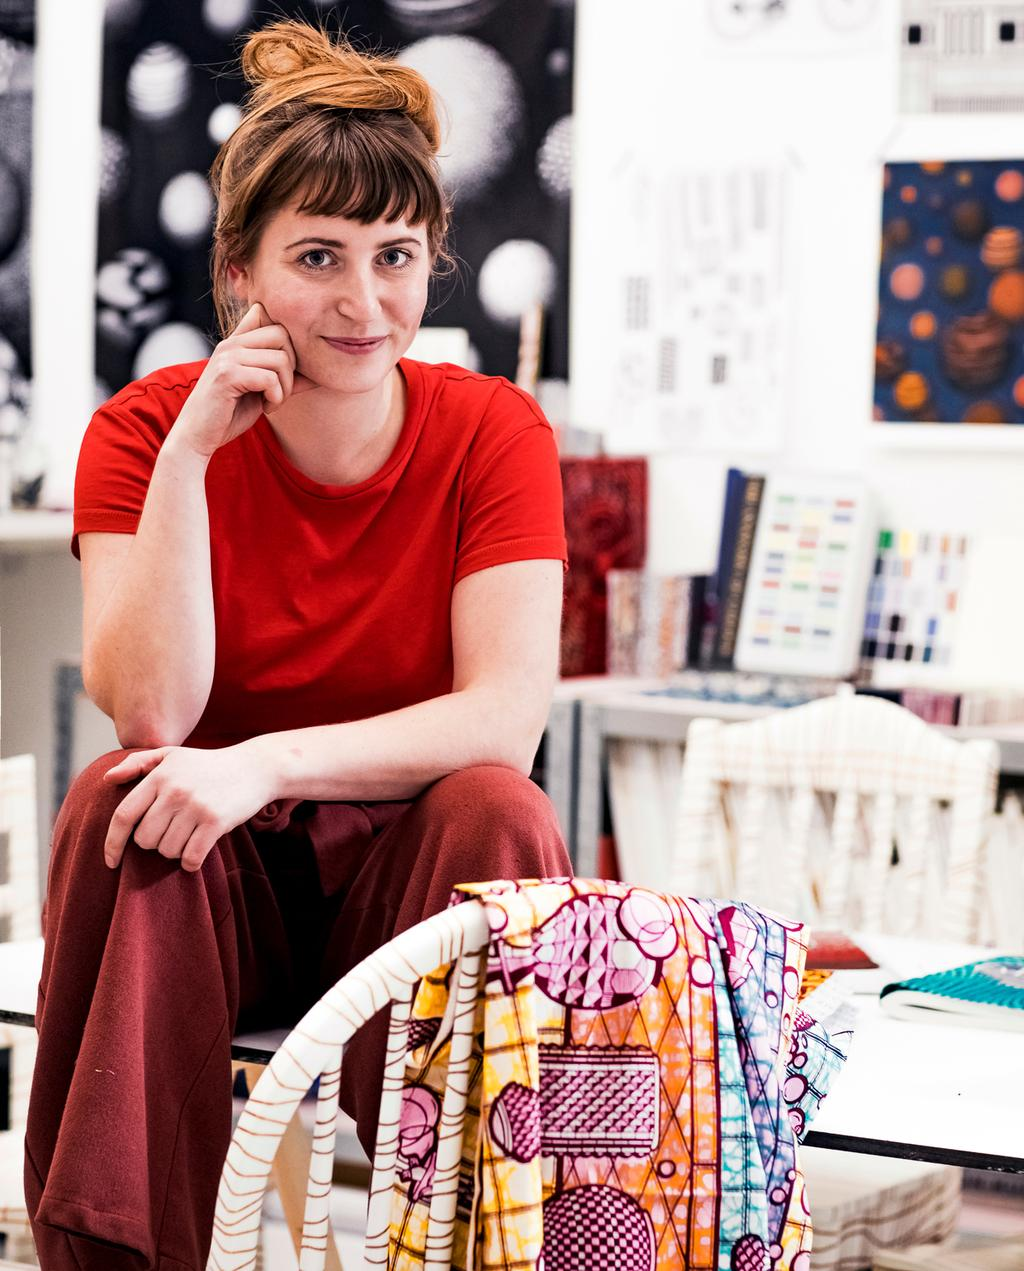 vtwonen 6-2019 | Ambacht Simone atelier | Ontdek het ambacht: recycle textiel